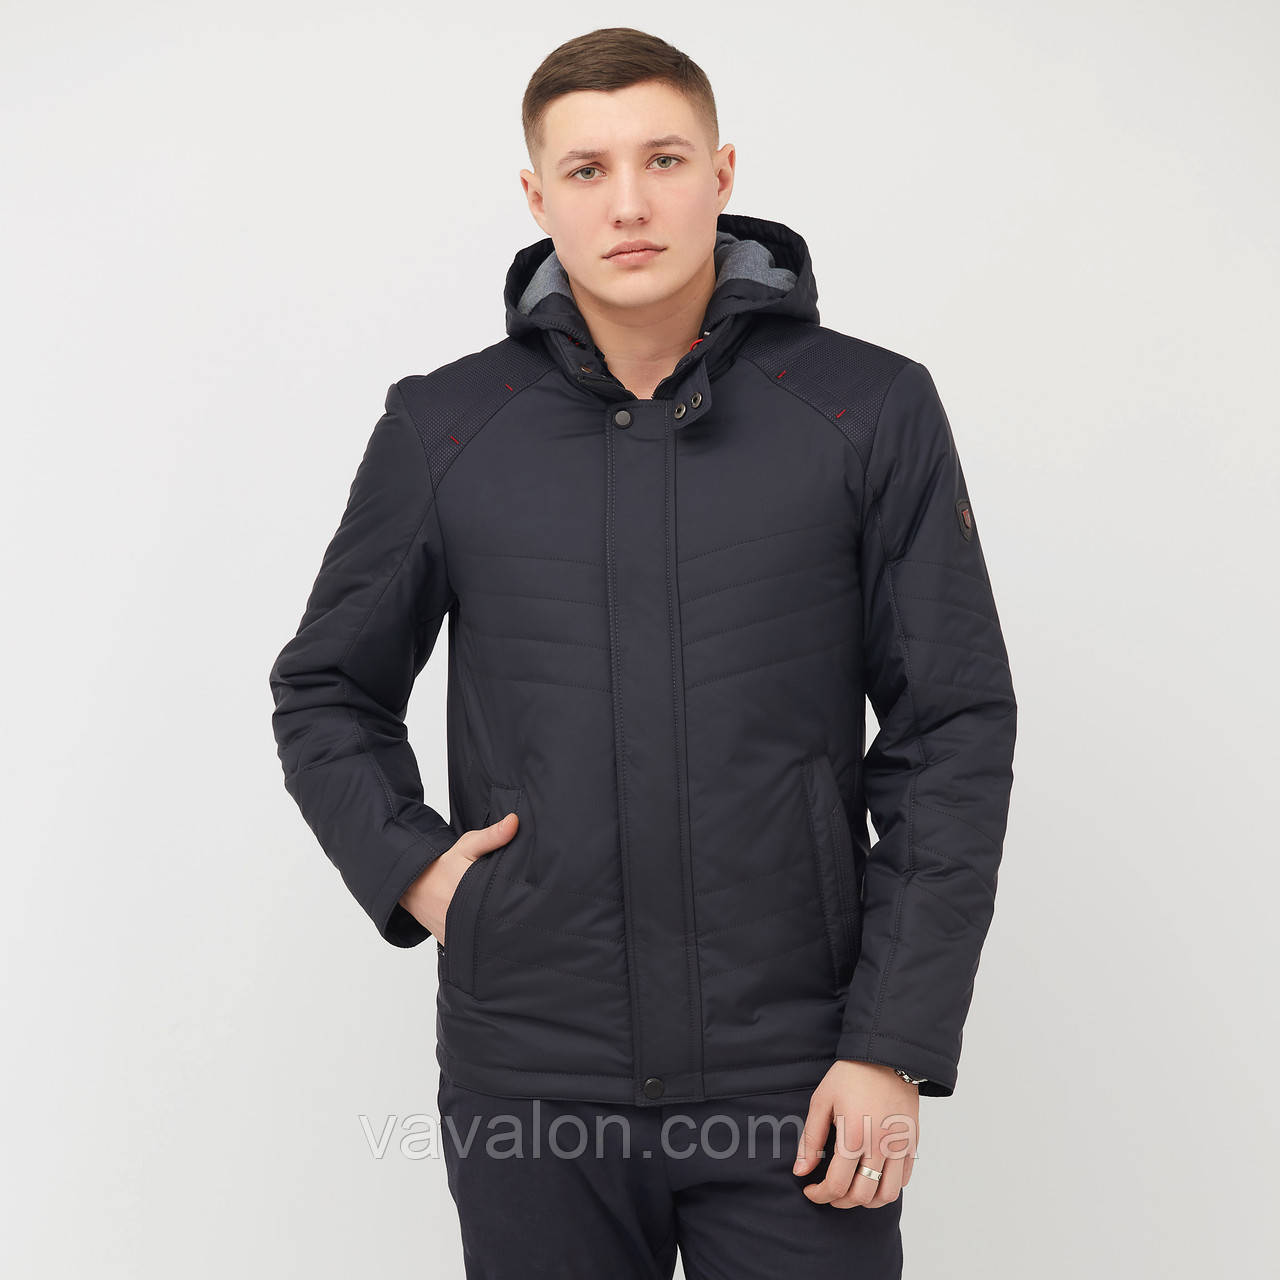 Куртка демисезонная Vavalon KD-183 navy